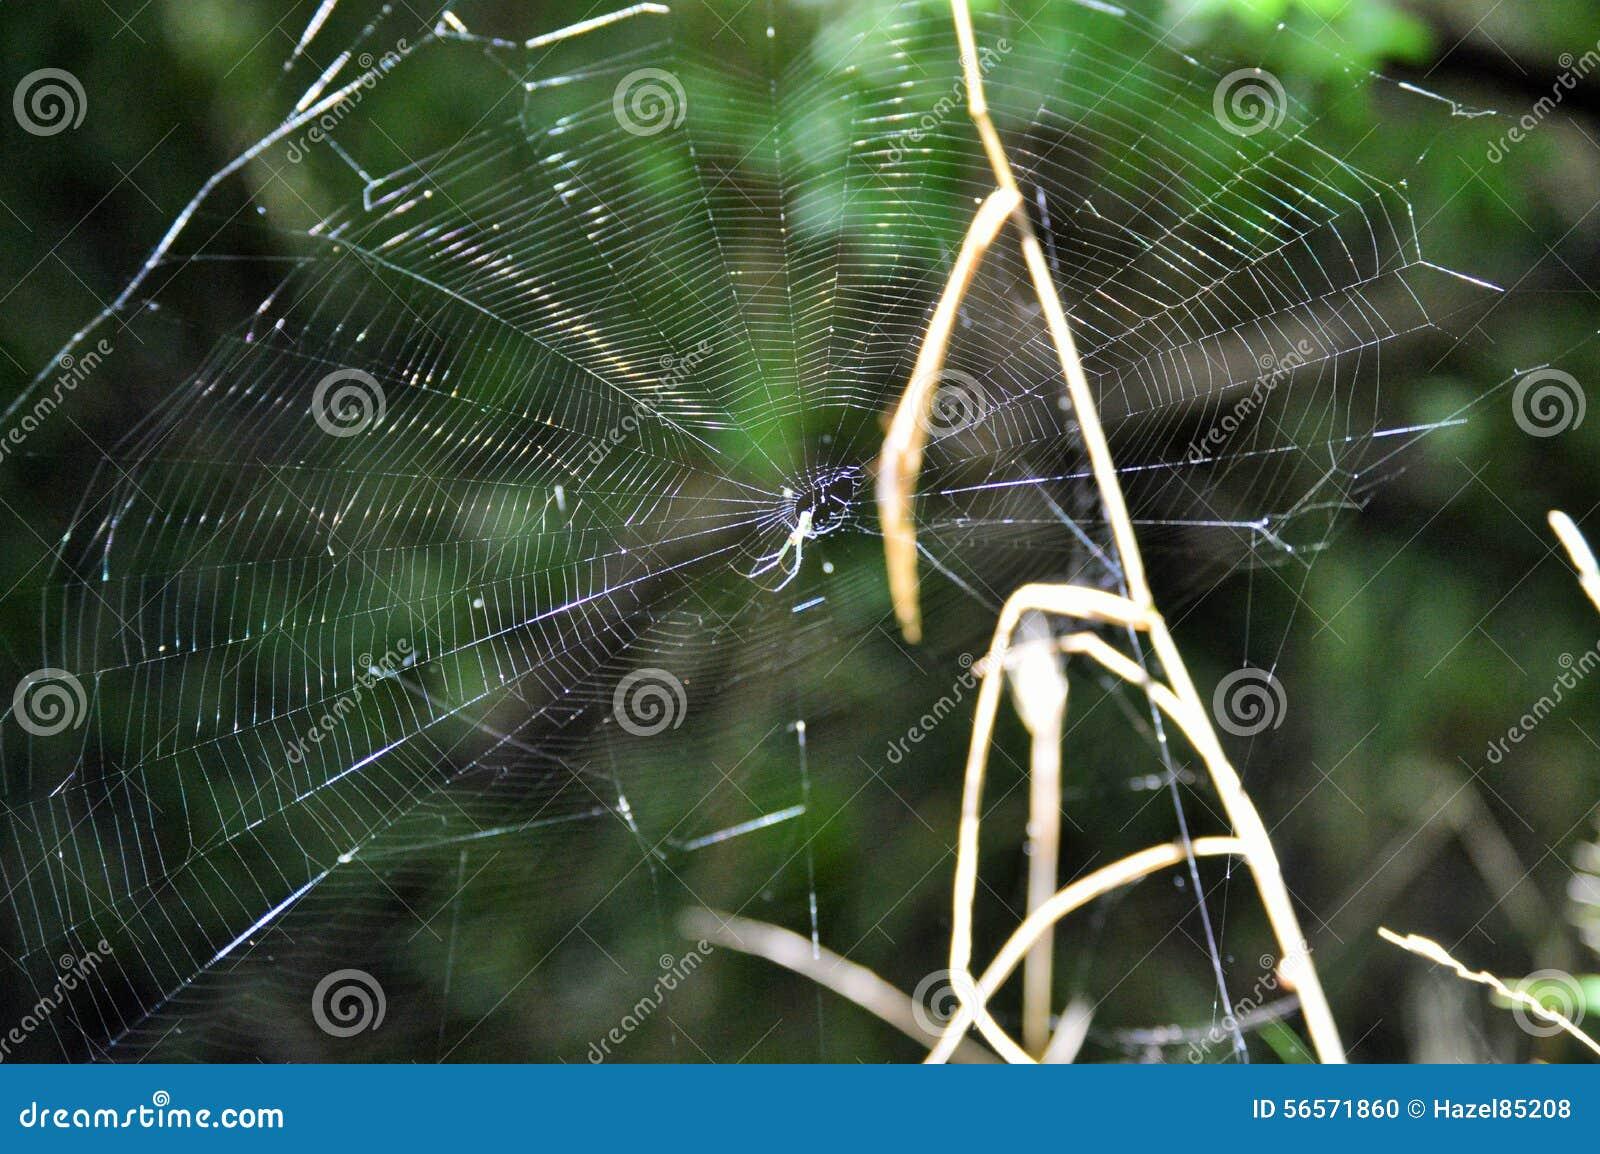 Download Λεπτομέρειες Spiderweb με την αράχνη Στοκ Εικόνες - εικόνα από wildlife, δάσος: 56571860